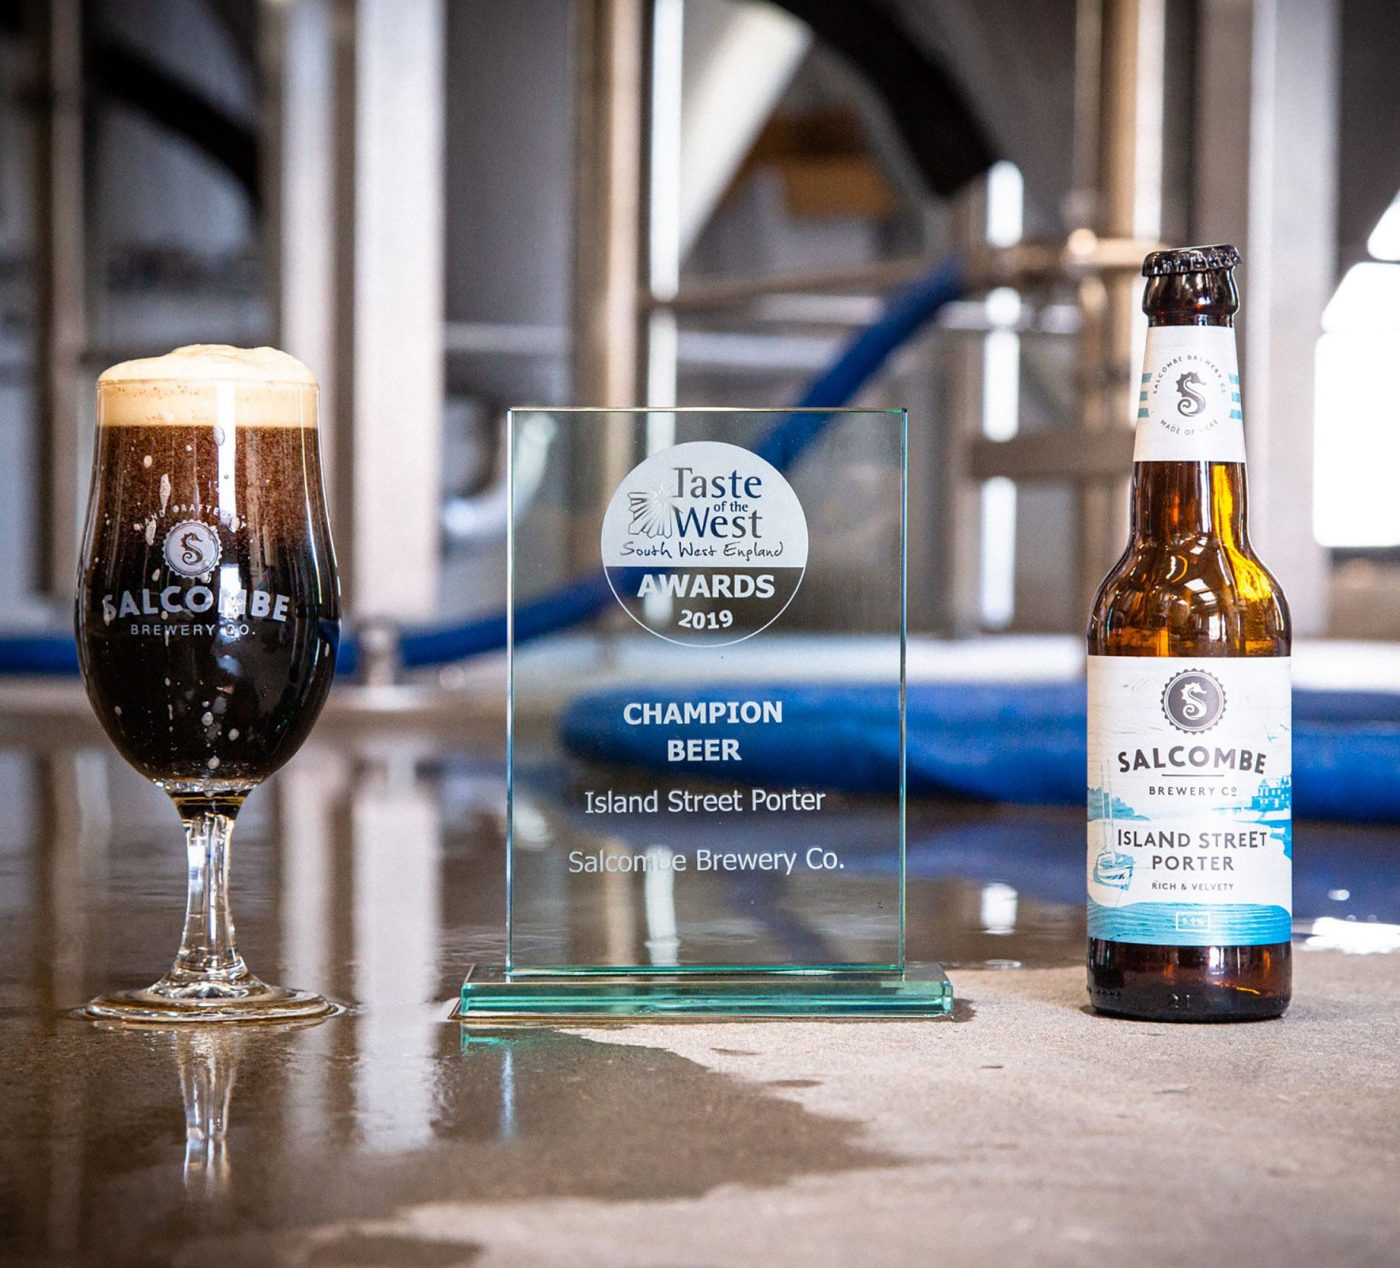 Taste of the West Awards Champion Beer